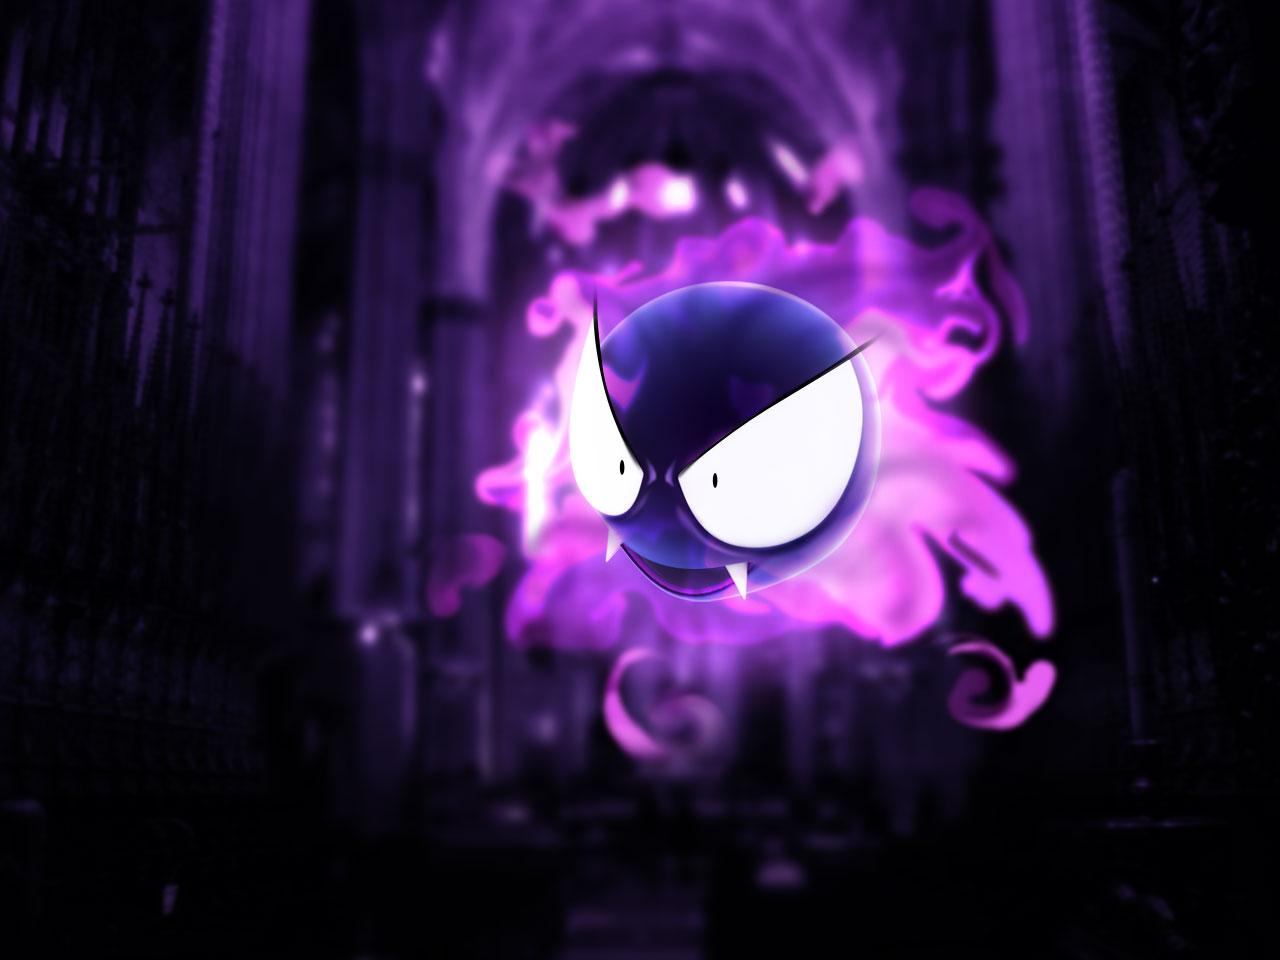 Pokémon Image - ID: 323974 - Image Abyss